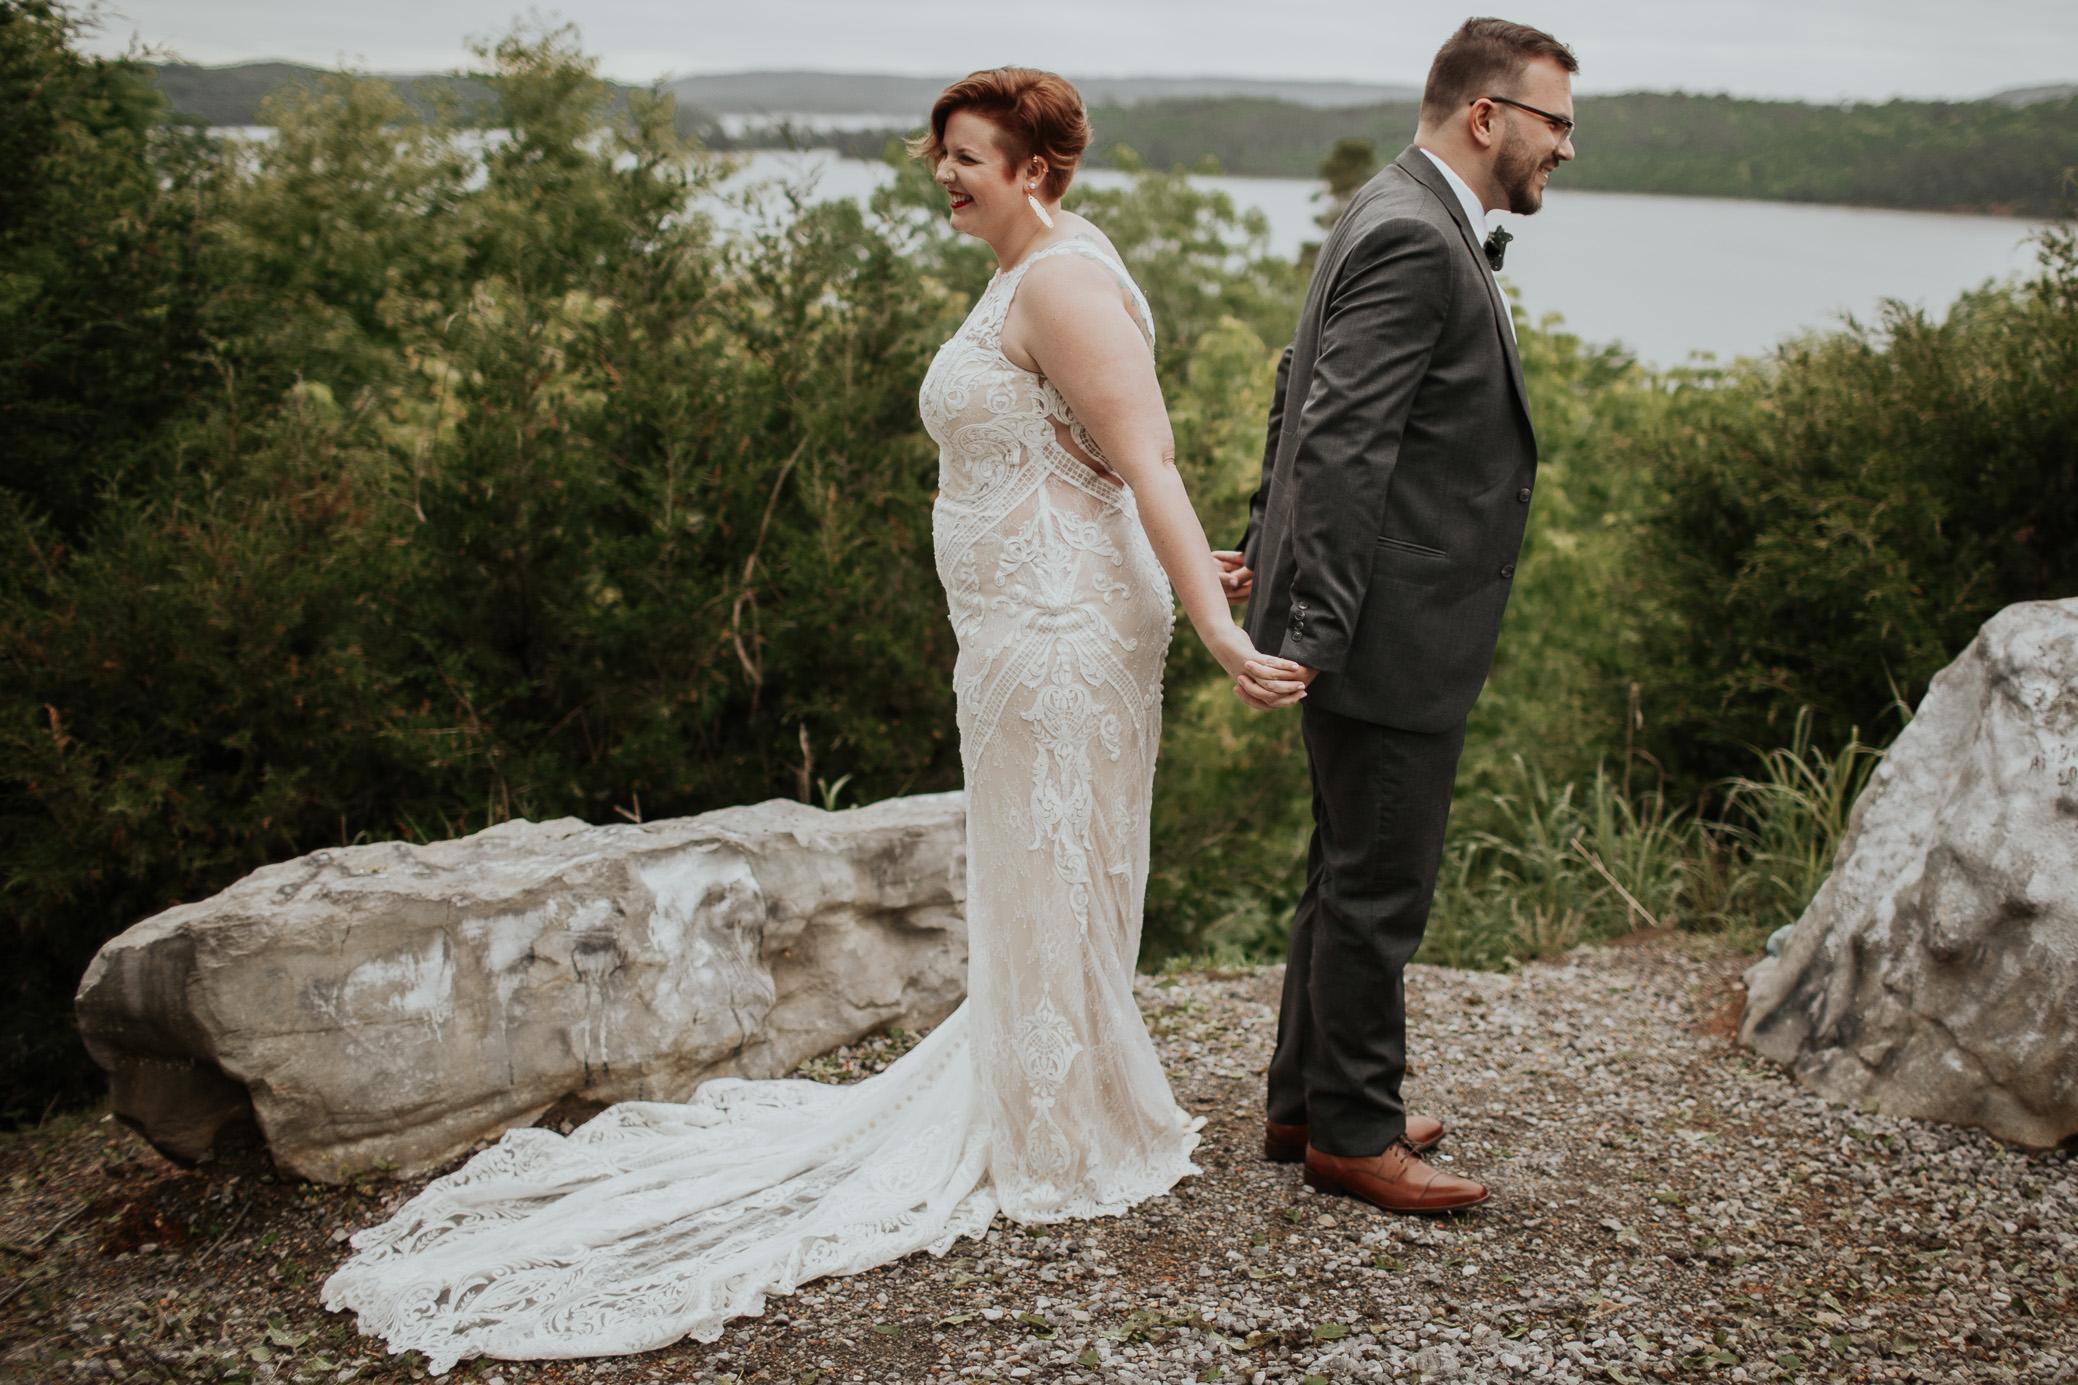 Alabama and Georgia wedding photography at Lake Guntersville State Park by David A. Smith of DSmithImages Wedding Photography, Portraits, and Events, a wedding photographer in Birmingham, Alabama and Atlanta, Georgia.